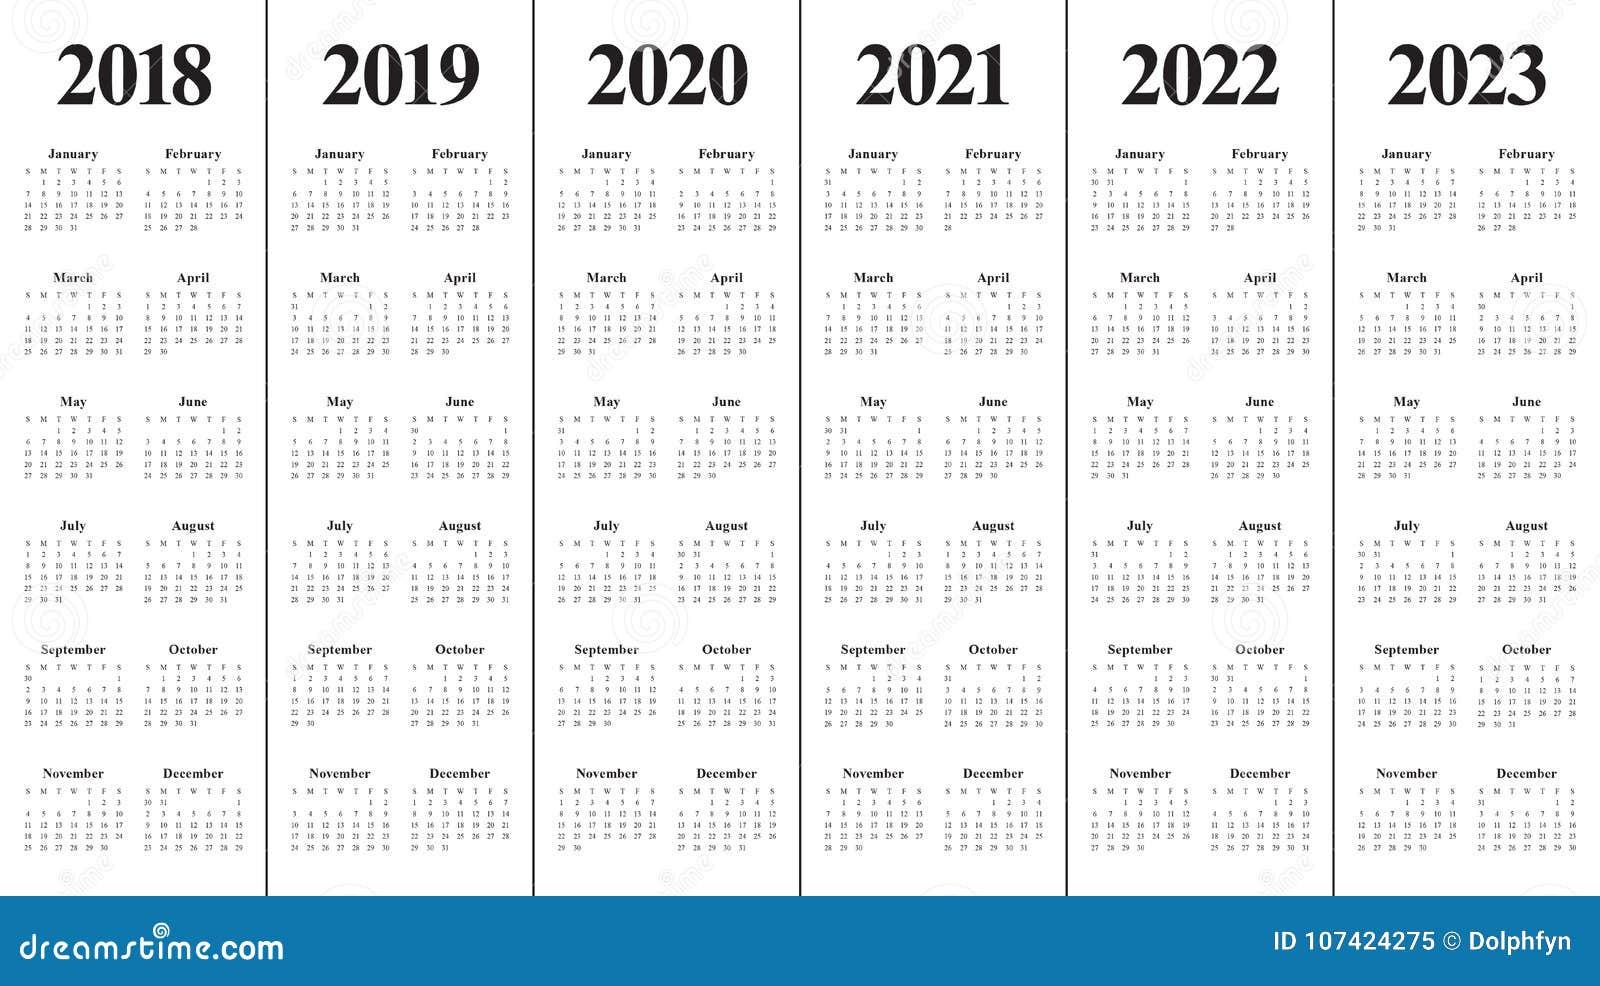 Year 2018 2019 2020 2021 2022 2023 calendar vector